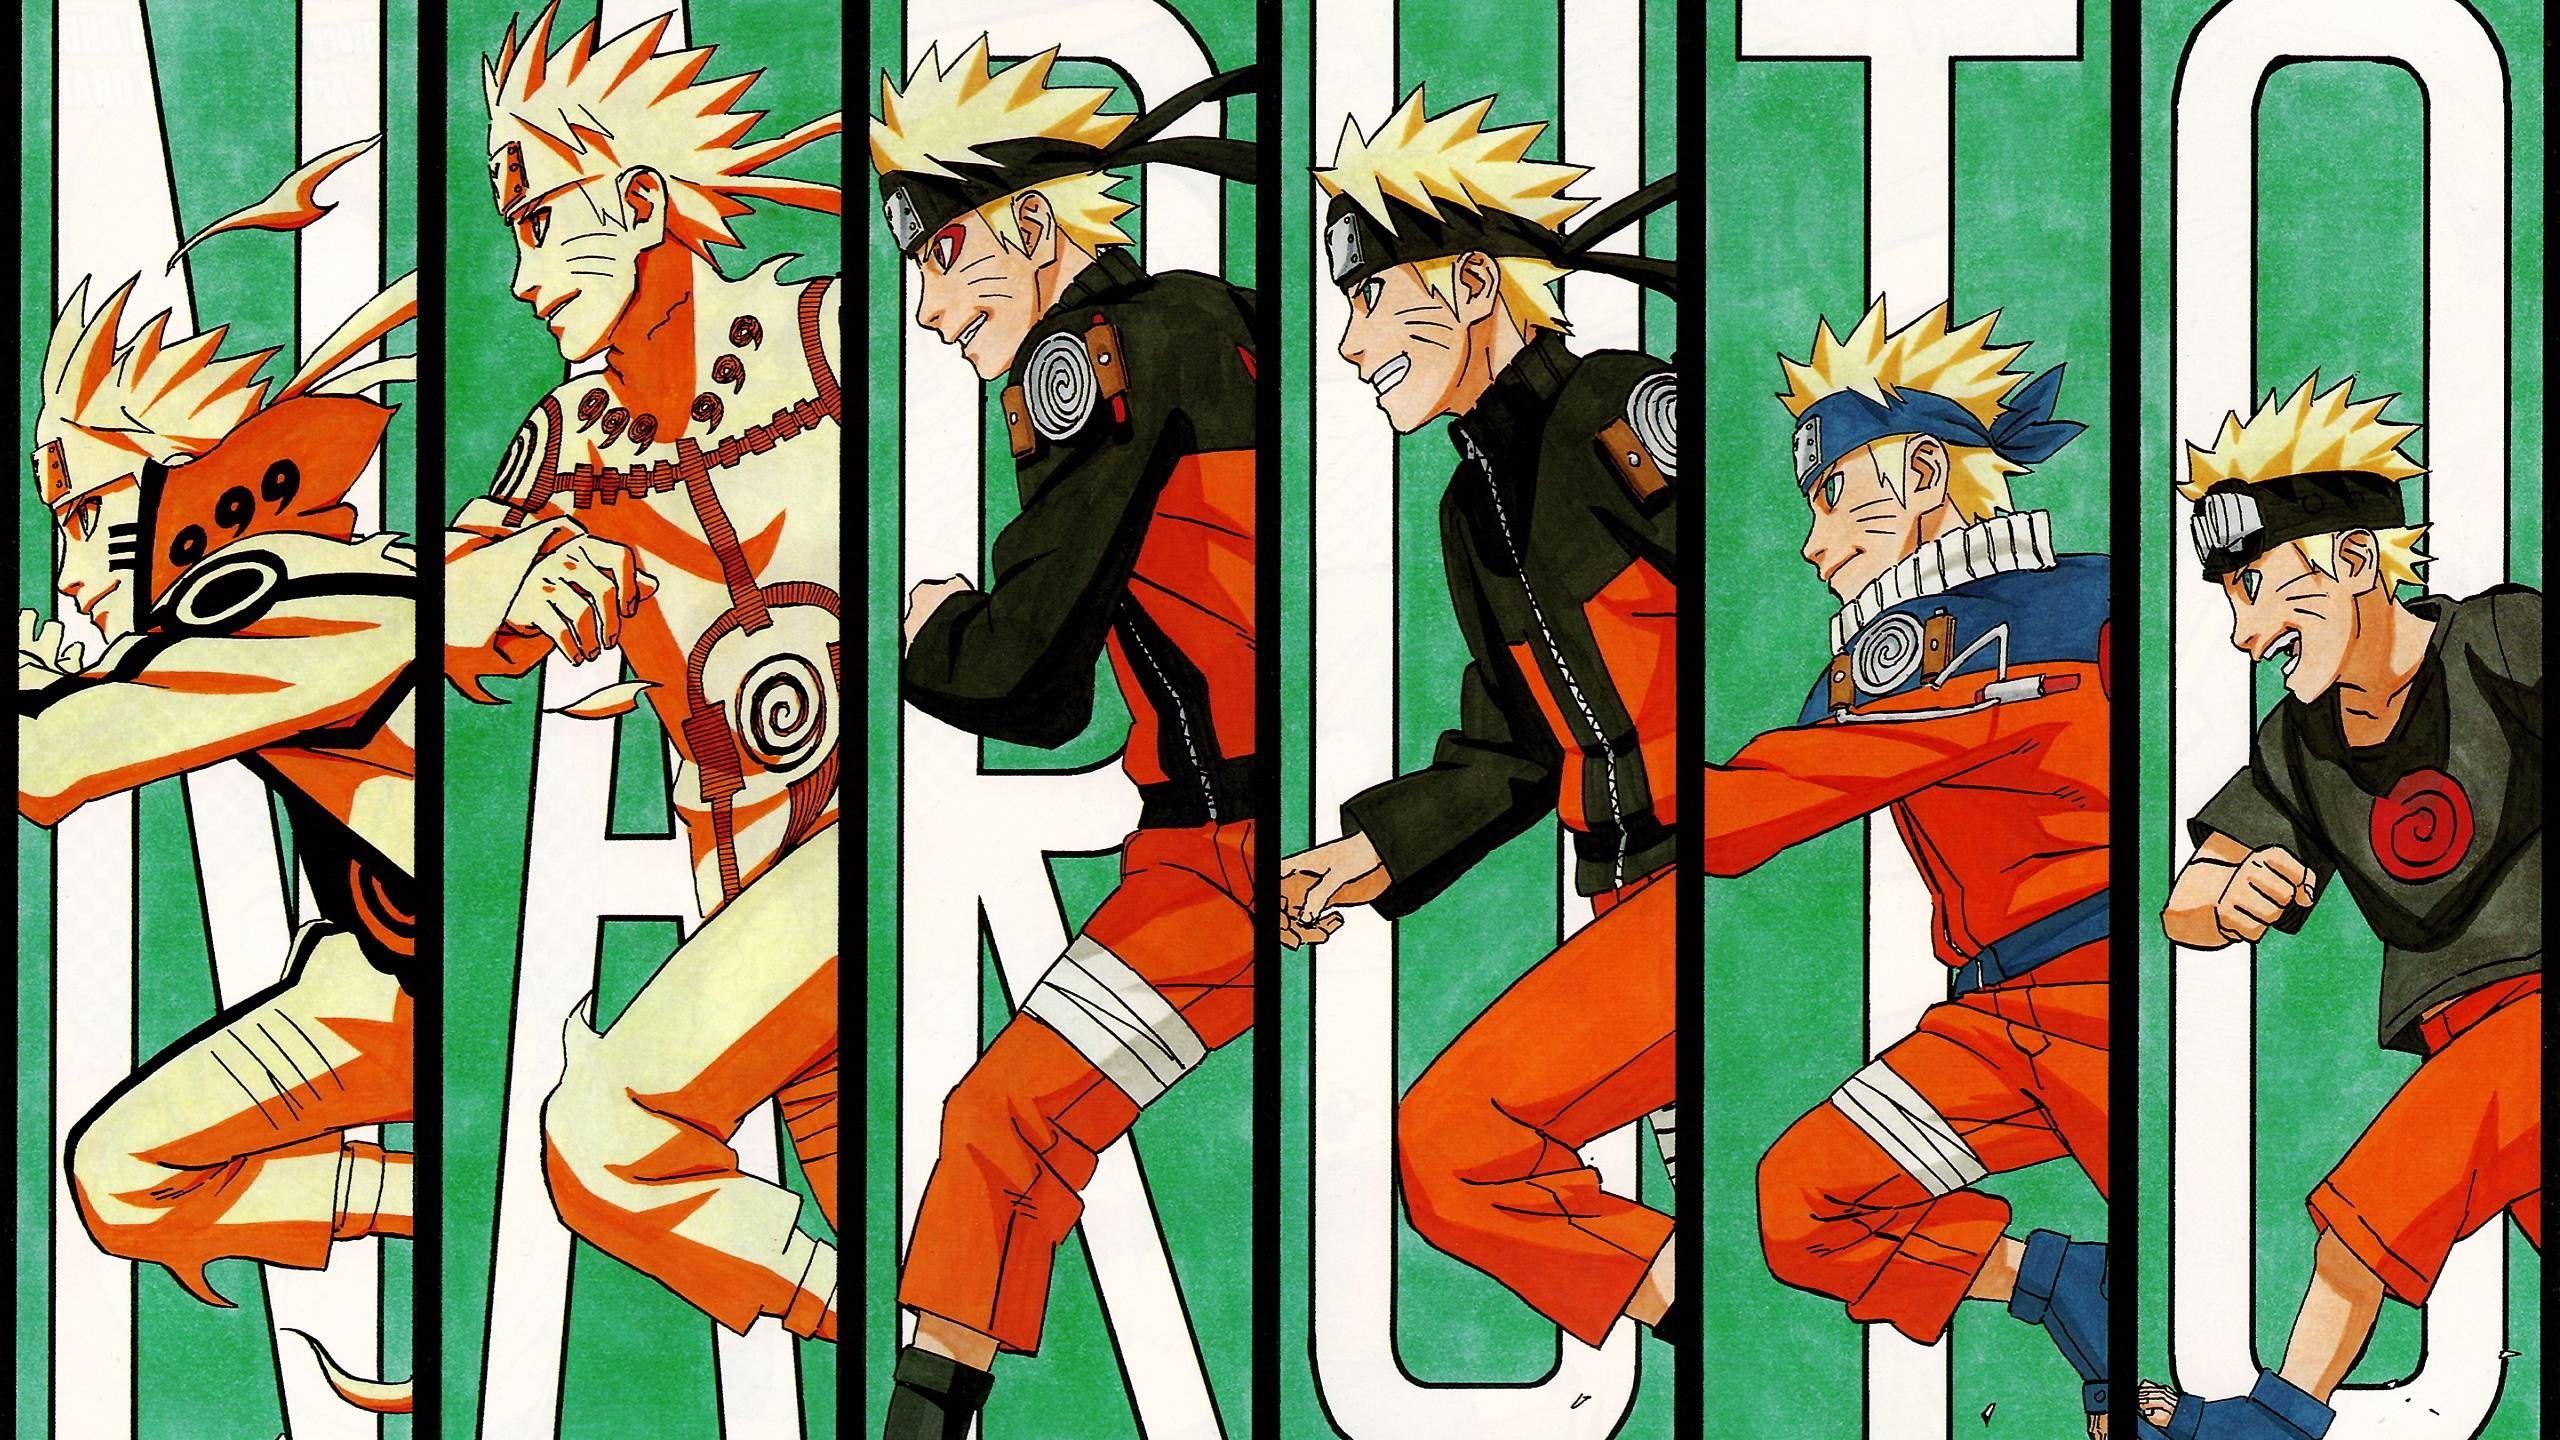 Good Wallpaper Naruto Cartoon - b7dab37c197d6d6a38769b5506ddebdf  Snapshot_143393.jpg